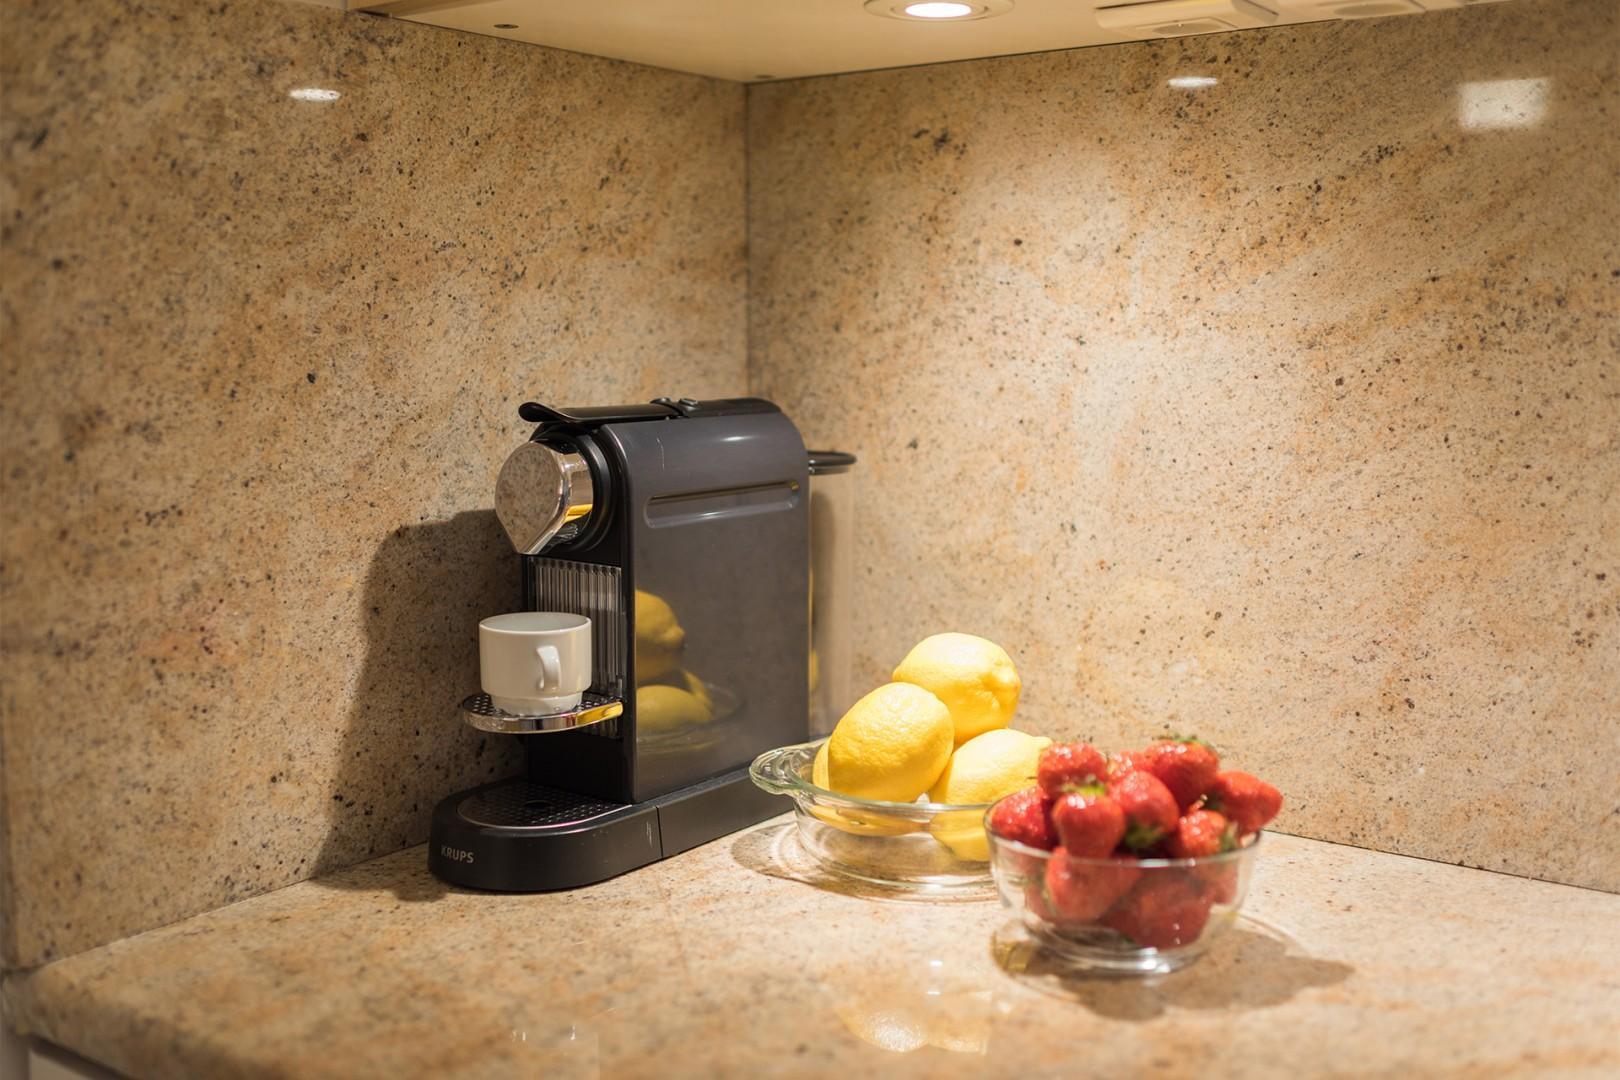 Enjoy freshly brewed coffee every morning!